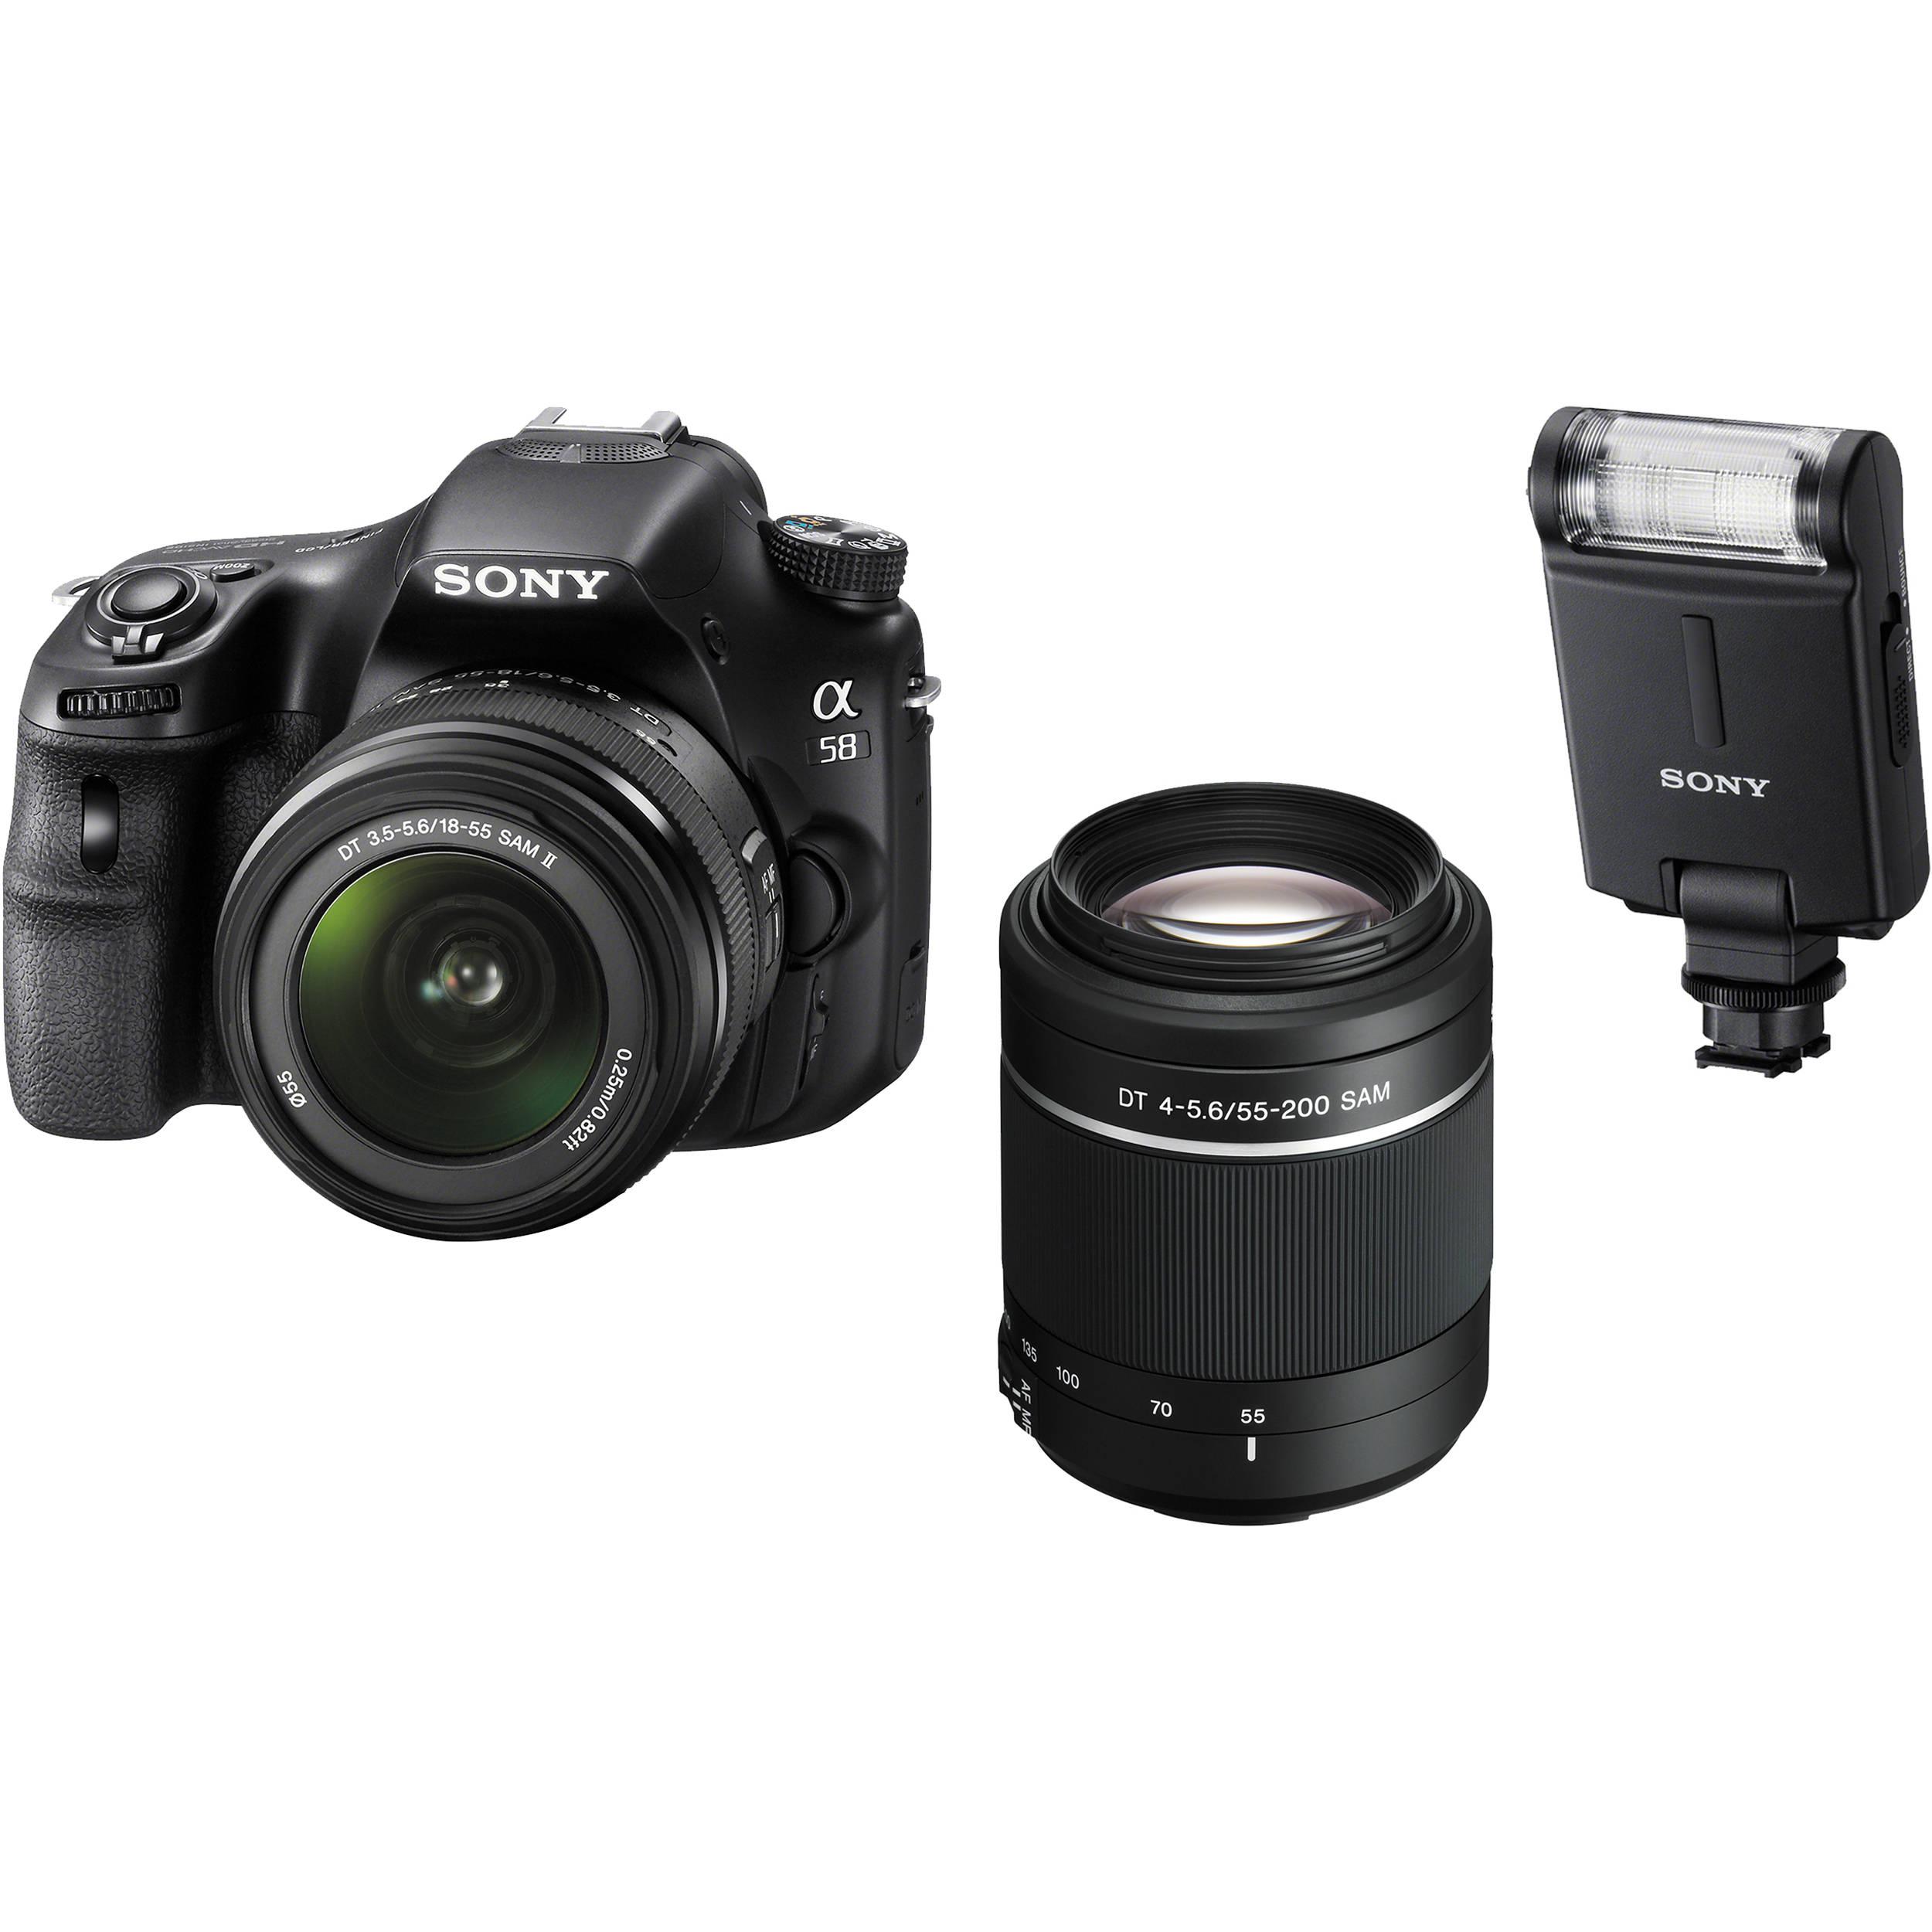 Camera Slt Camera Vs Dslr sony a58 vs a65 images guru sltakflbdl alpha slt